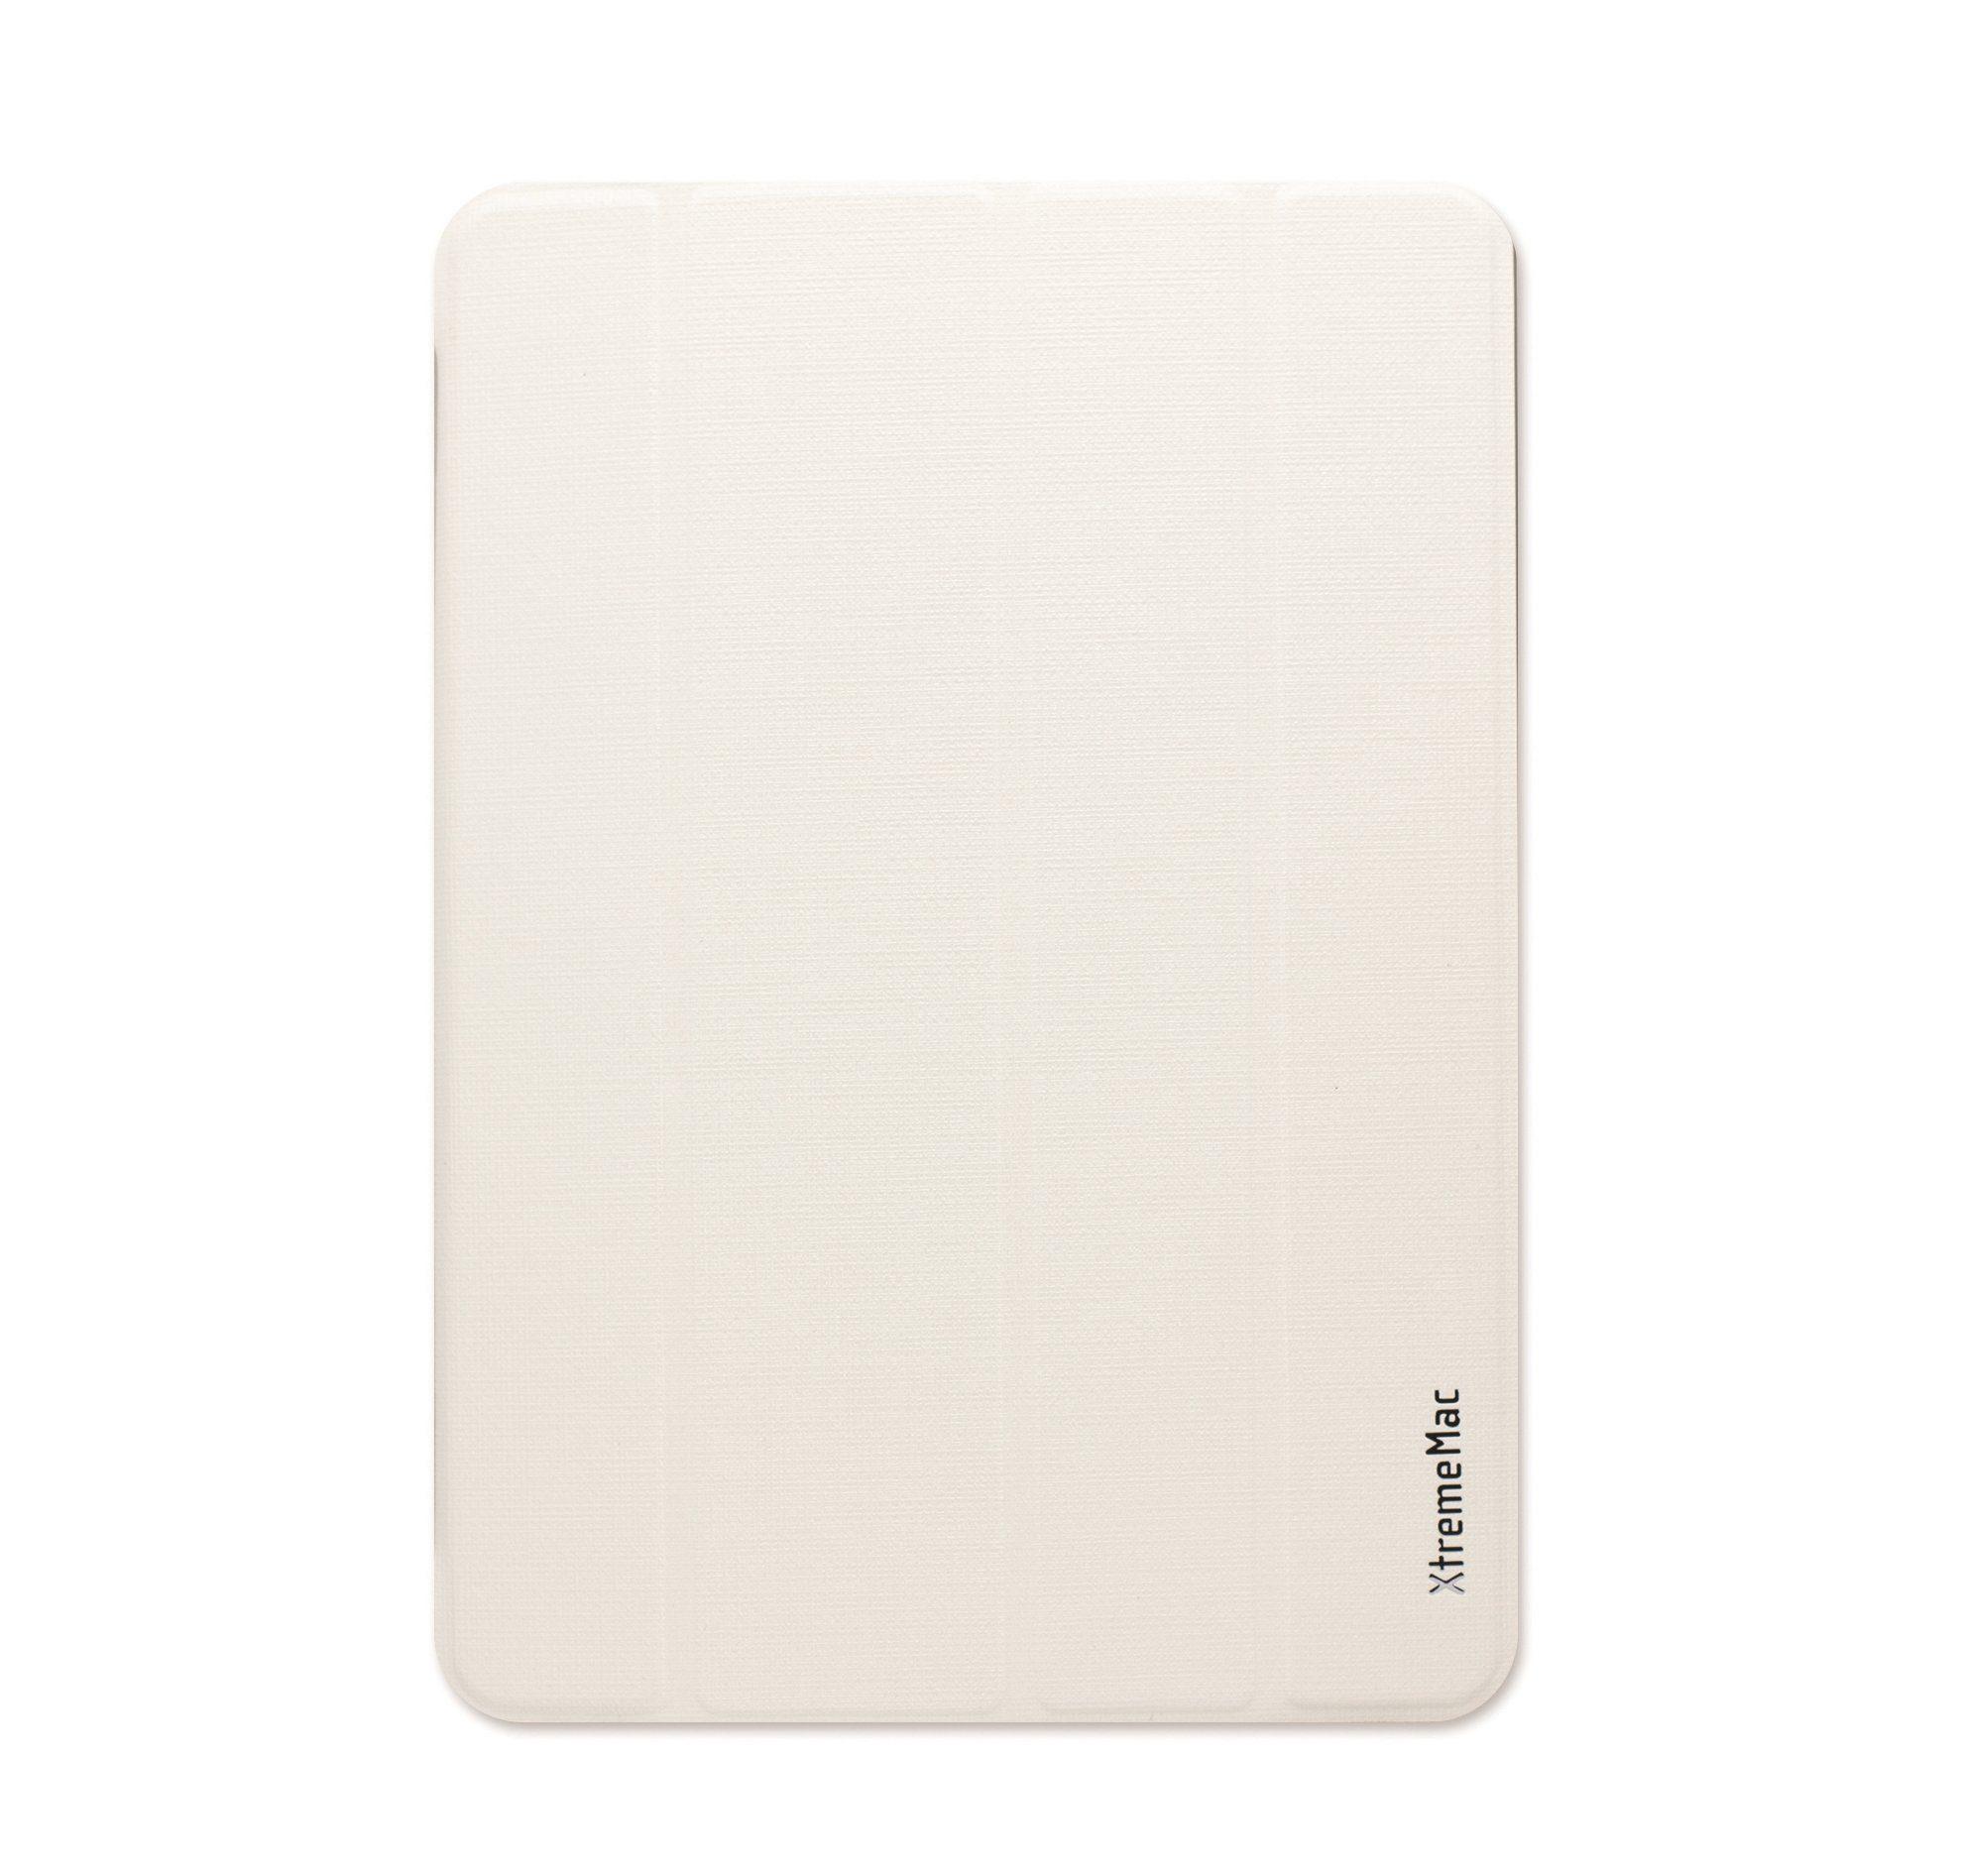 XtremeMac faltbare Schutzhülle für iPad Air 2 »MicroFolio«